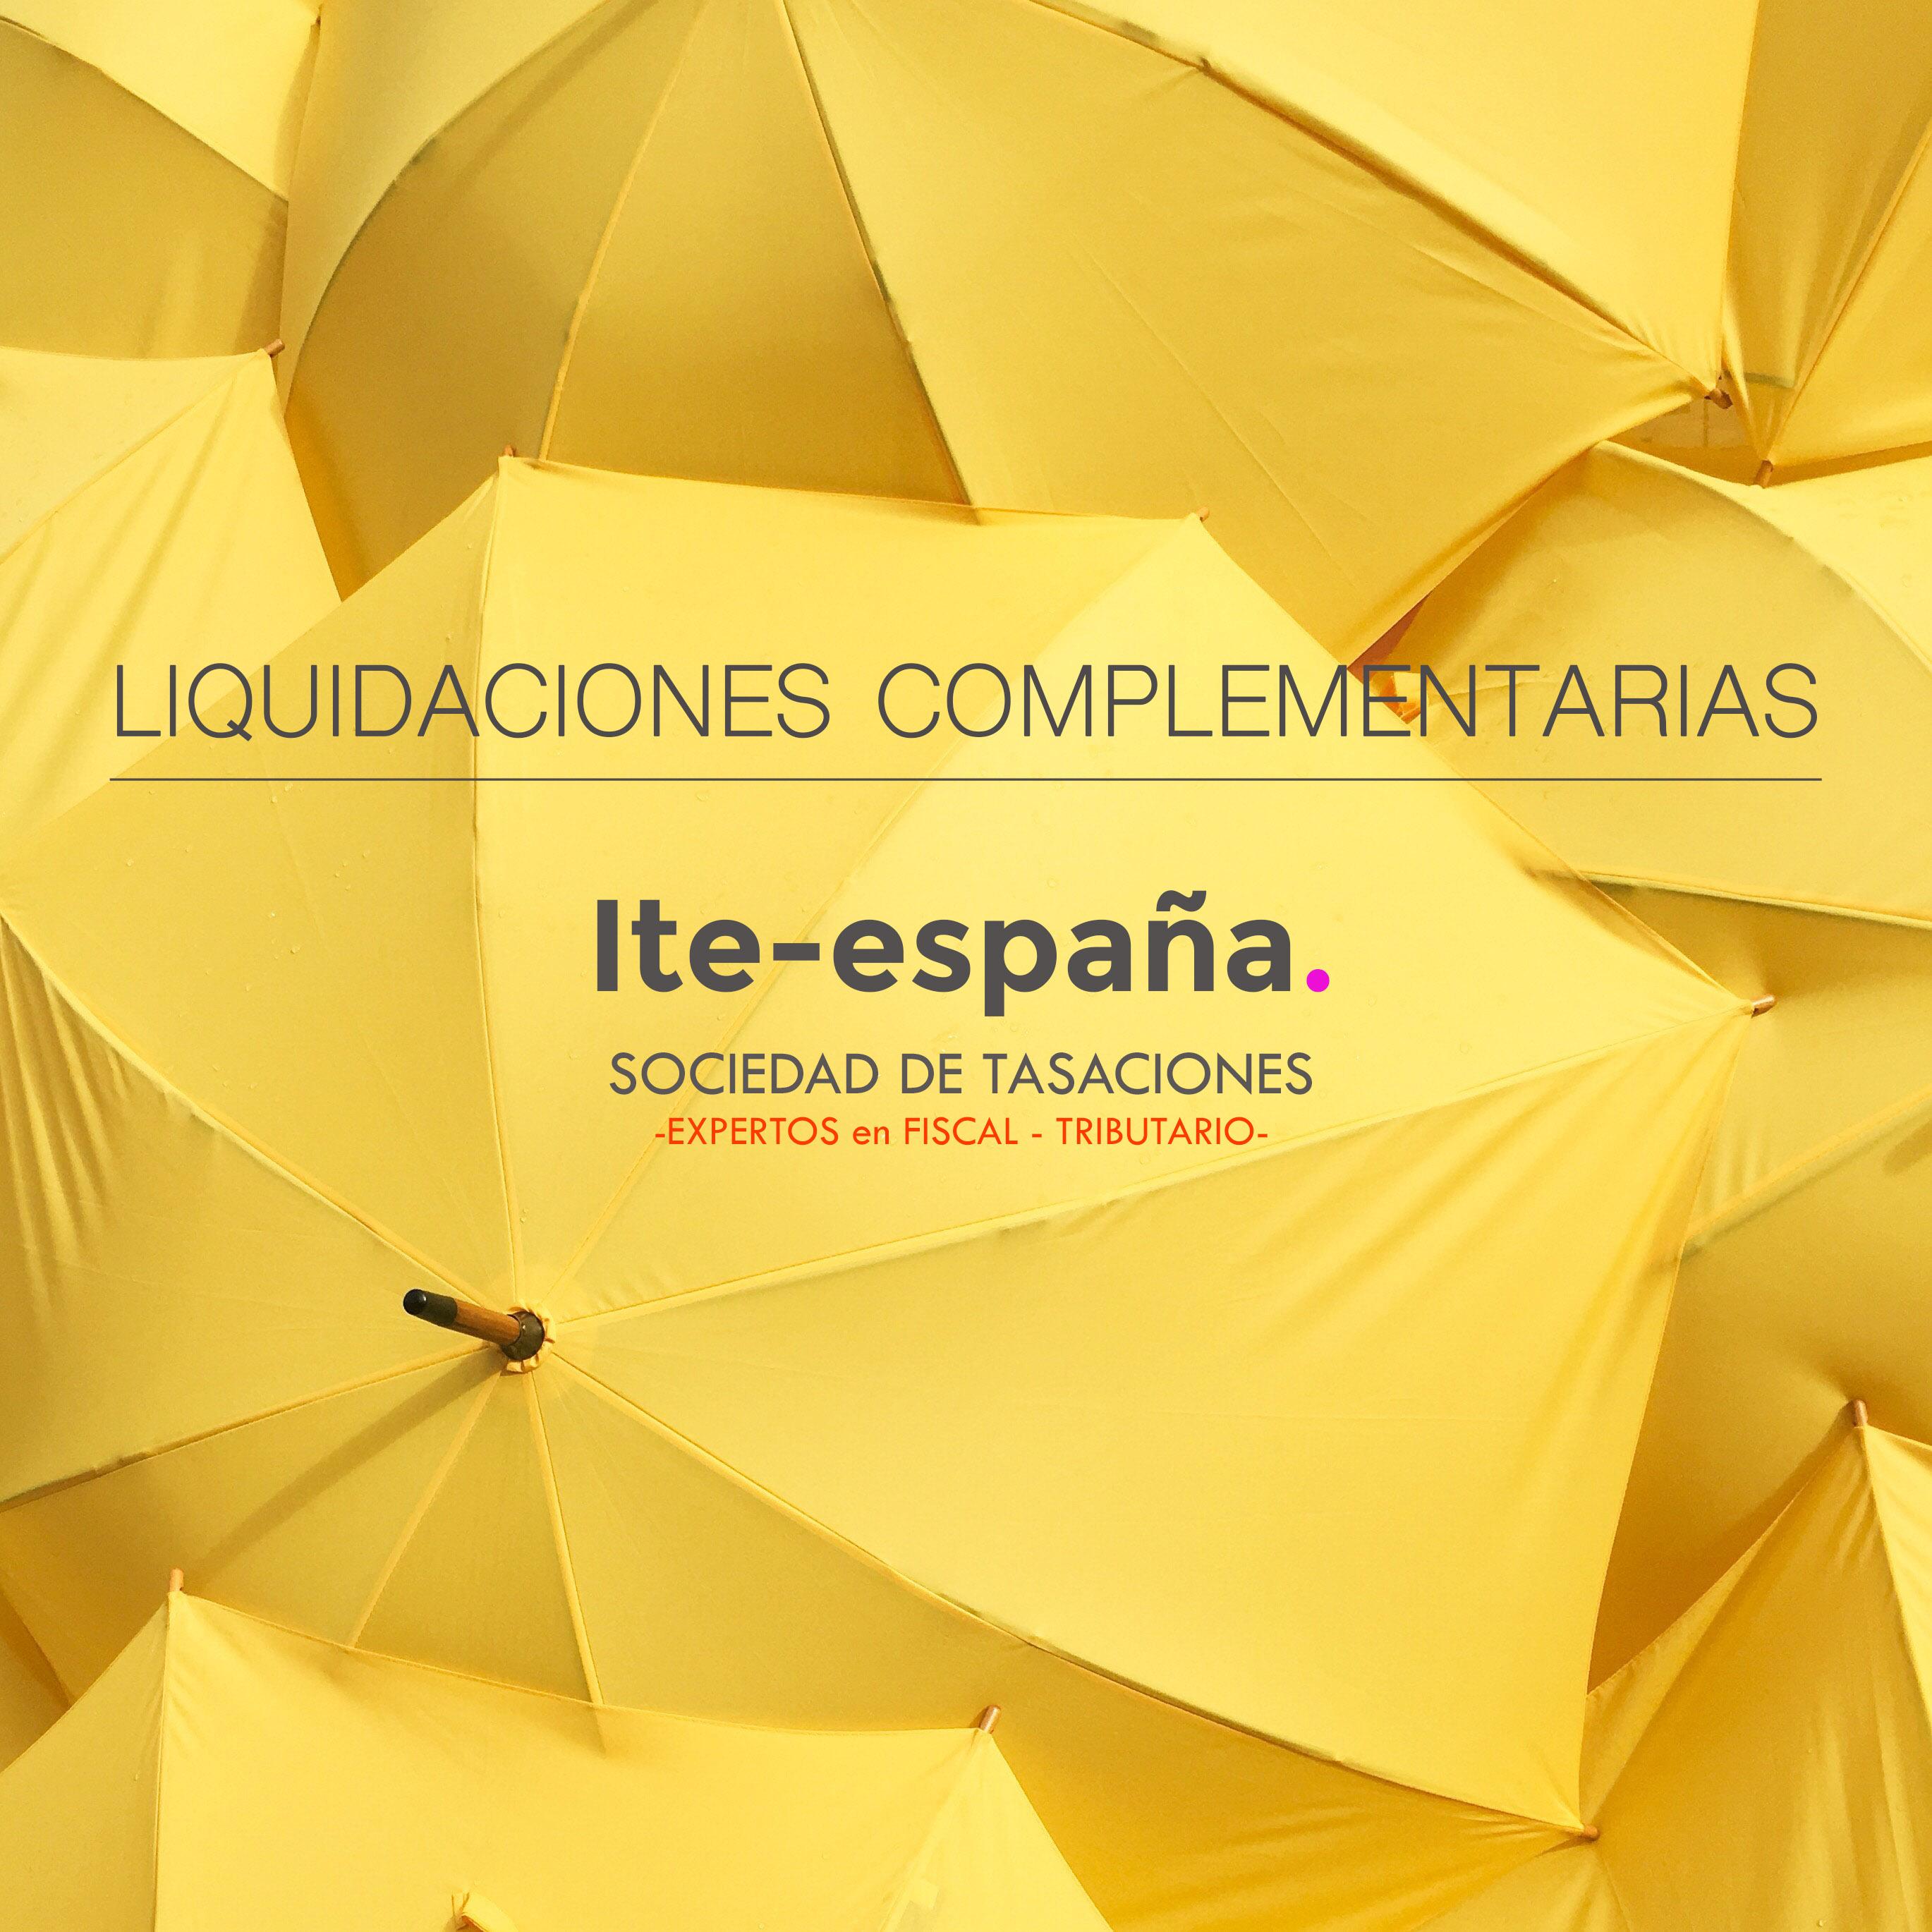 Liquidacion provisional hacienda